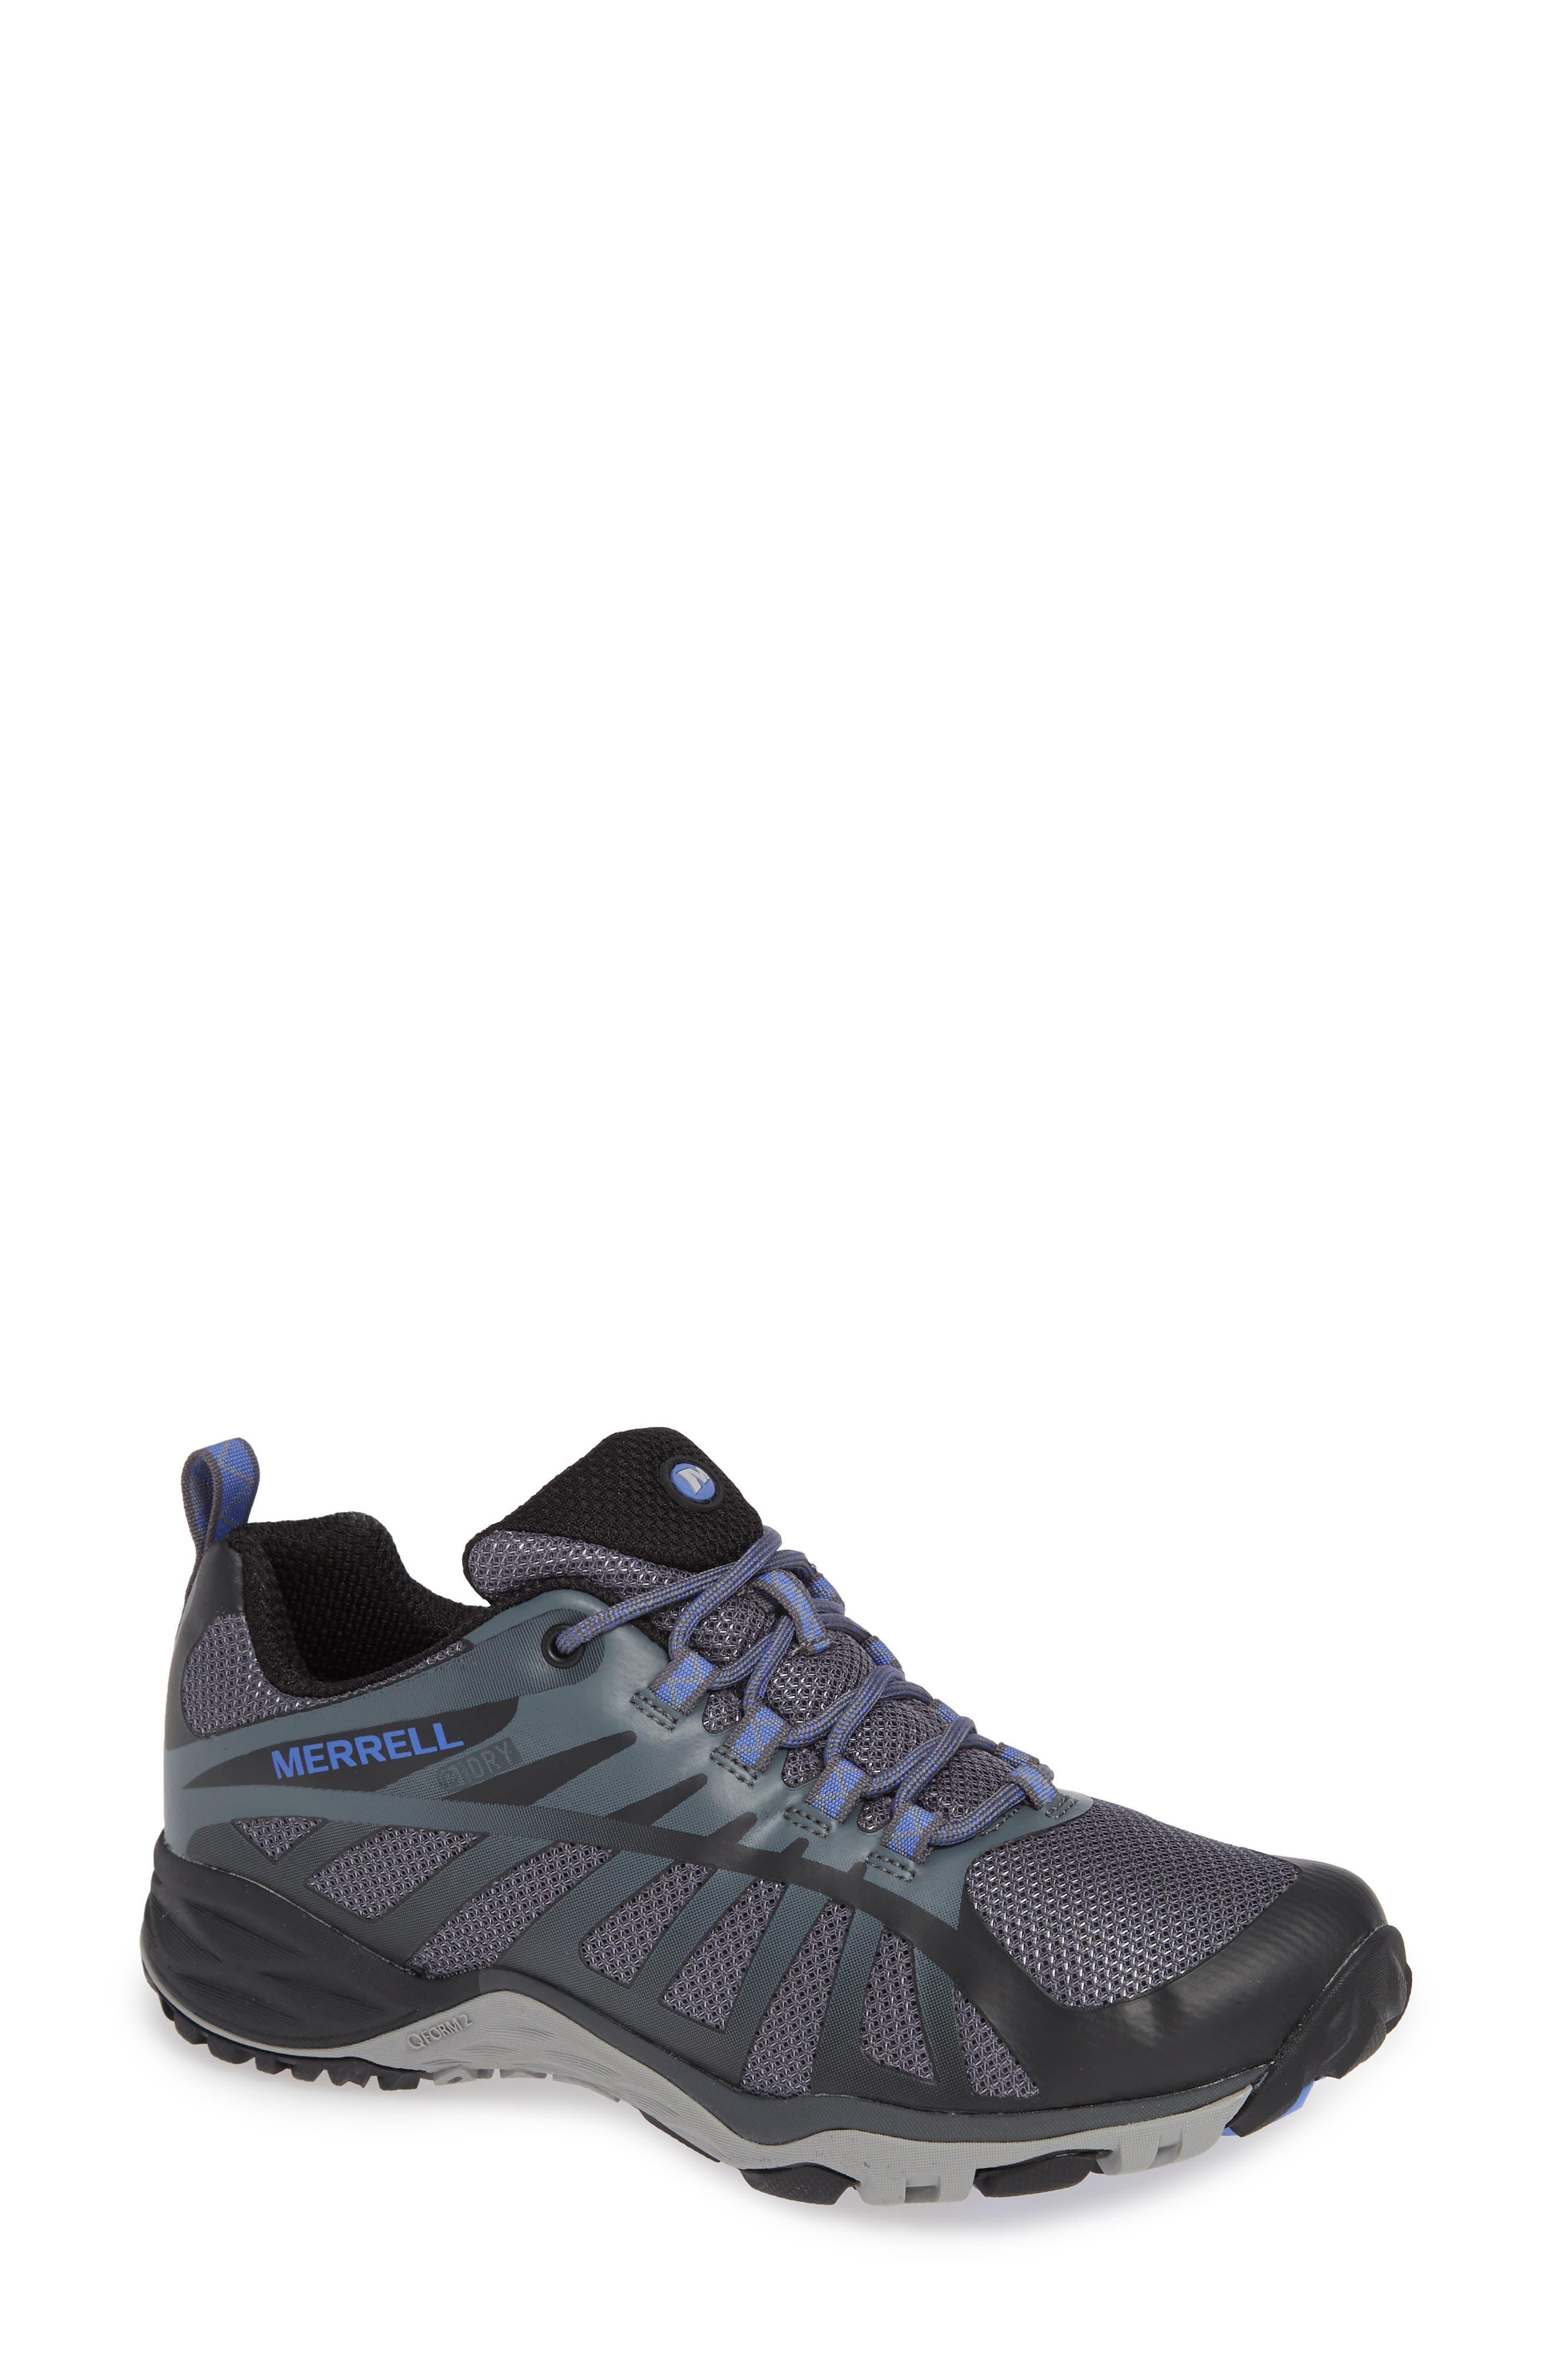 MERRELL, Siren Edge Waterproof Q2 Hiking Shoe, Main thumbnail 1, color, BLACK FABRIC